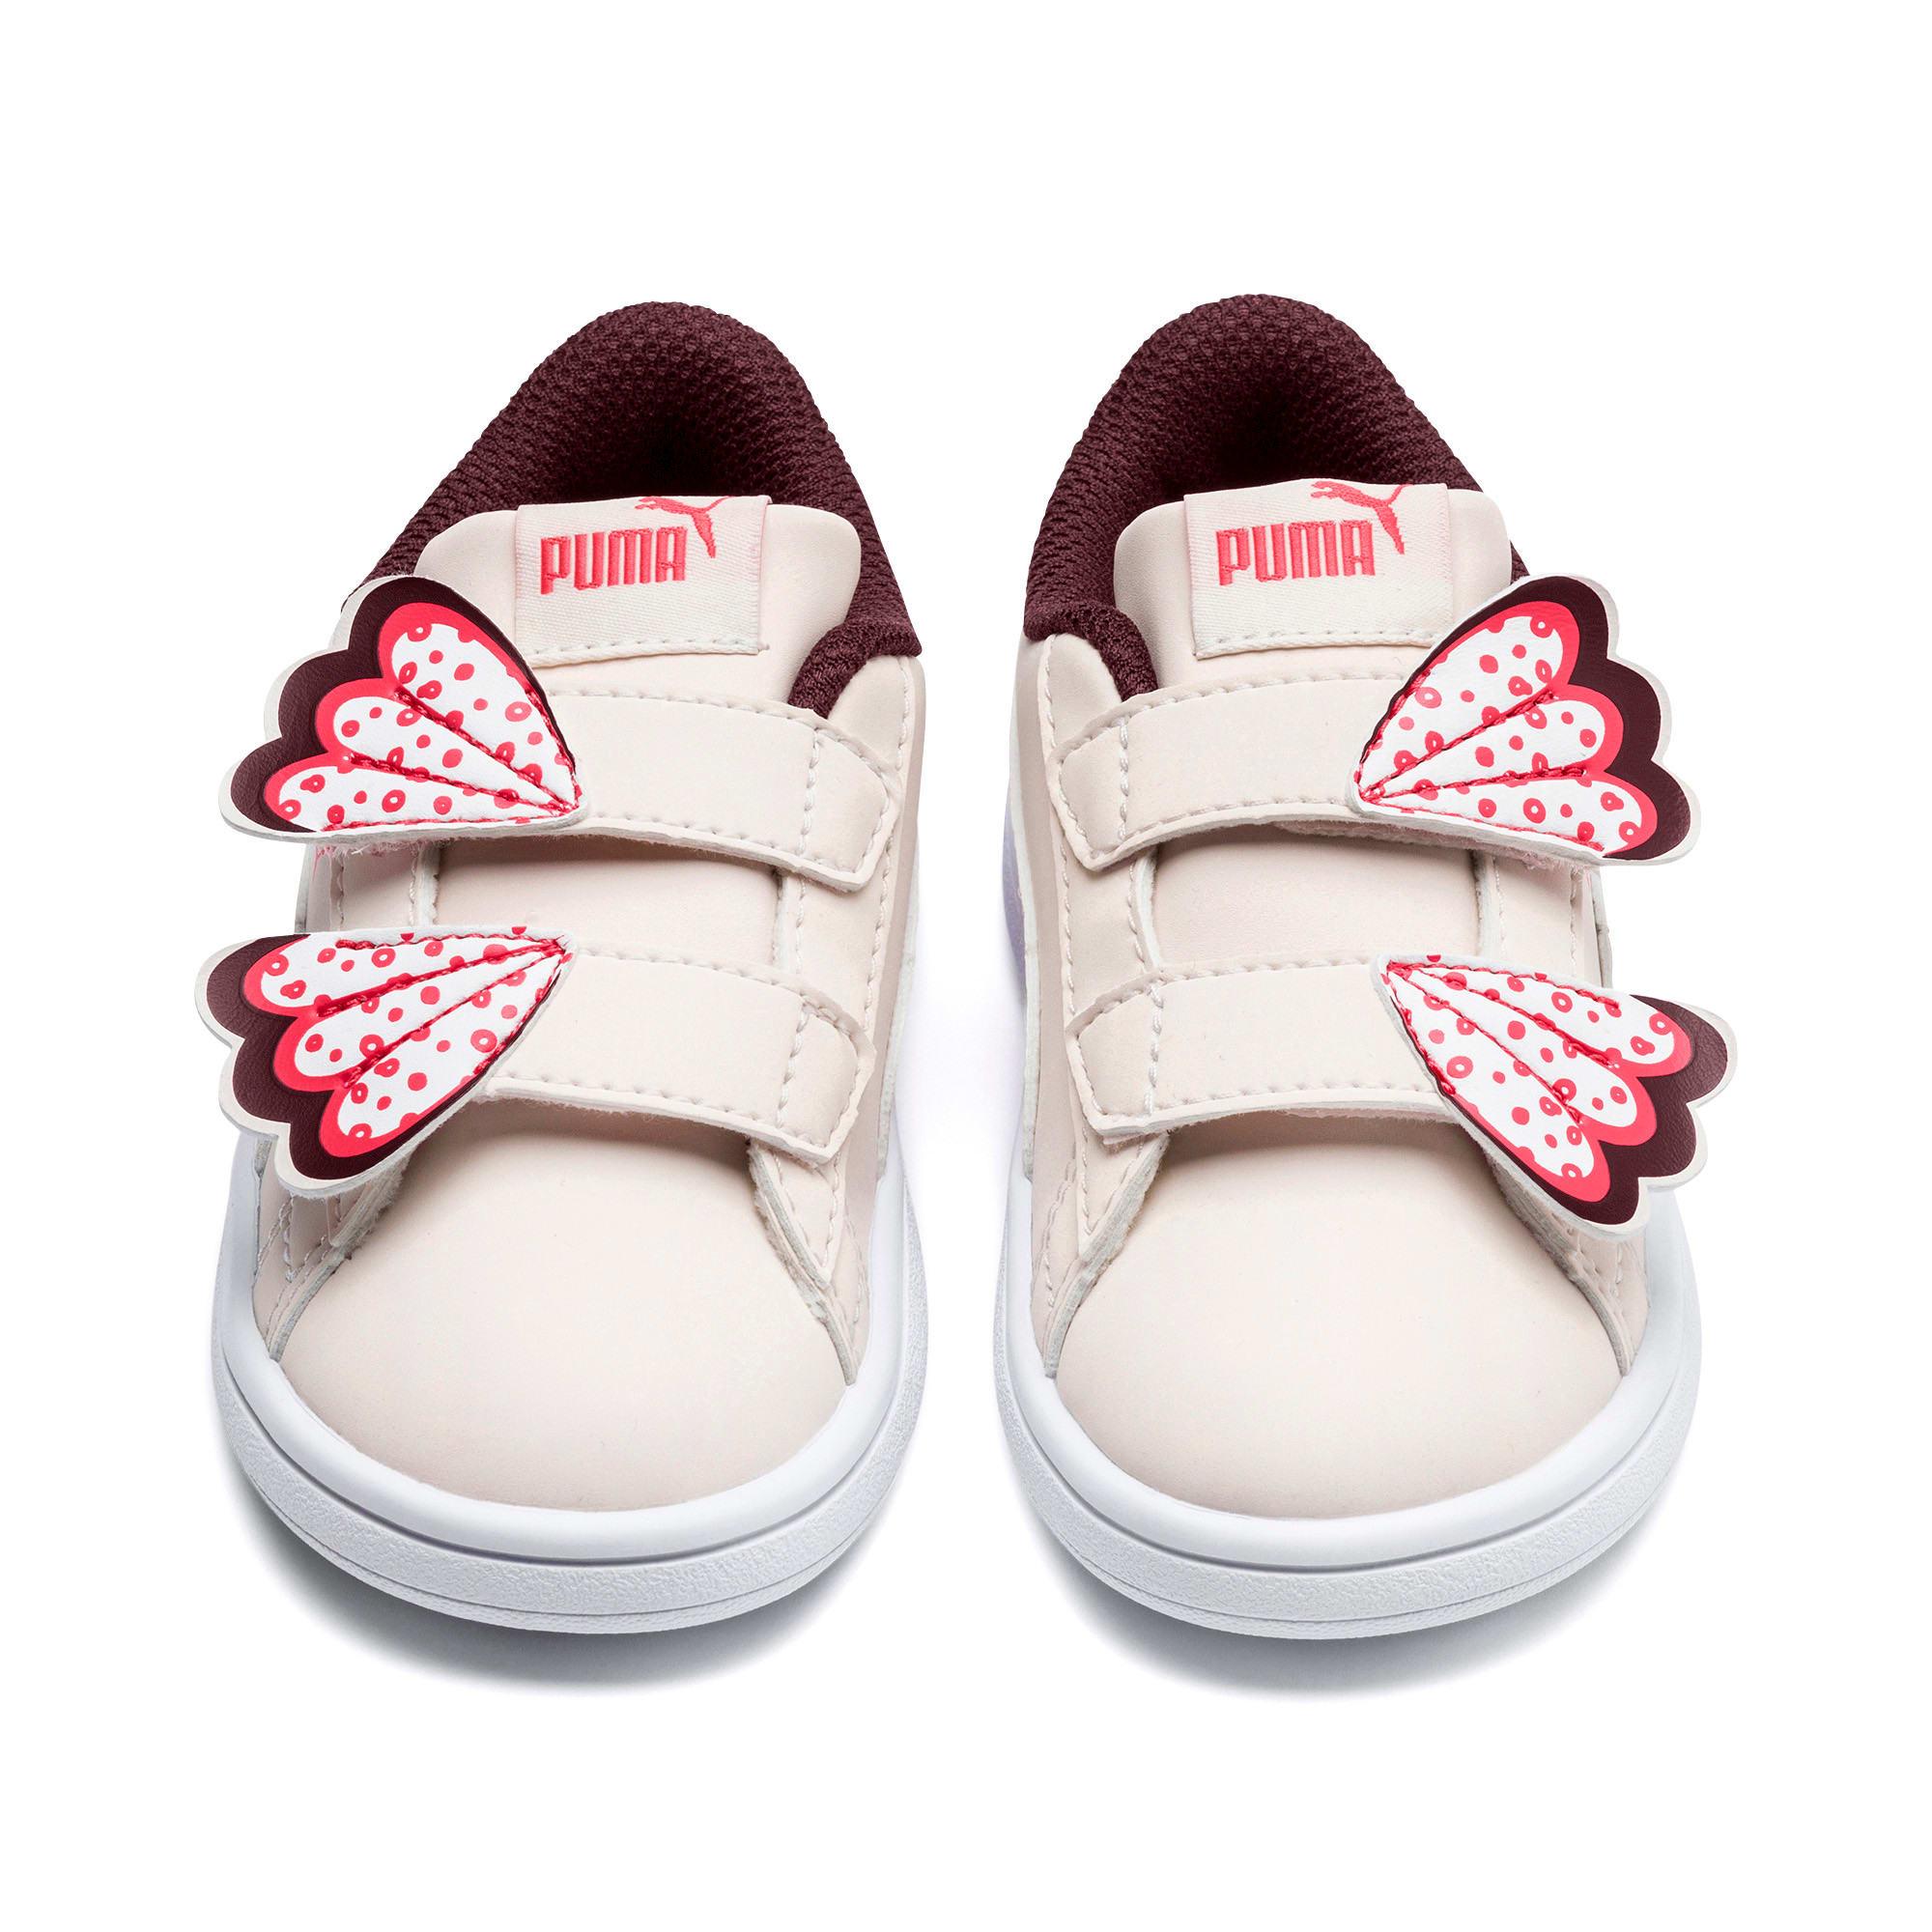 new product 46bd3 cfa37 Scarpe da ginnastica PUMA Smash v2 Butterfly bambina